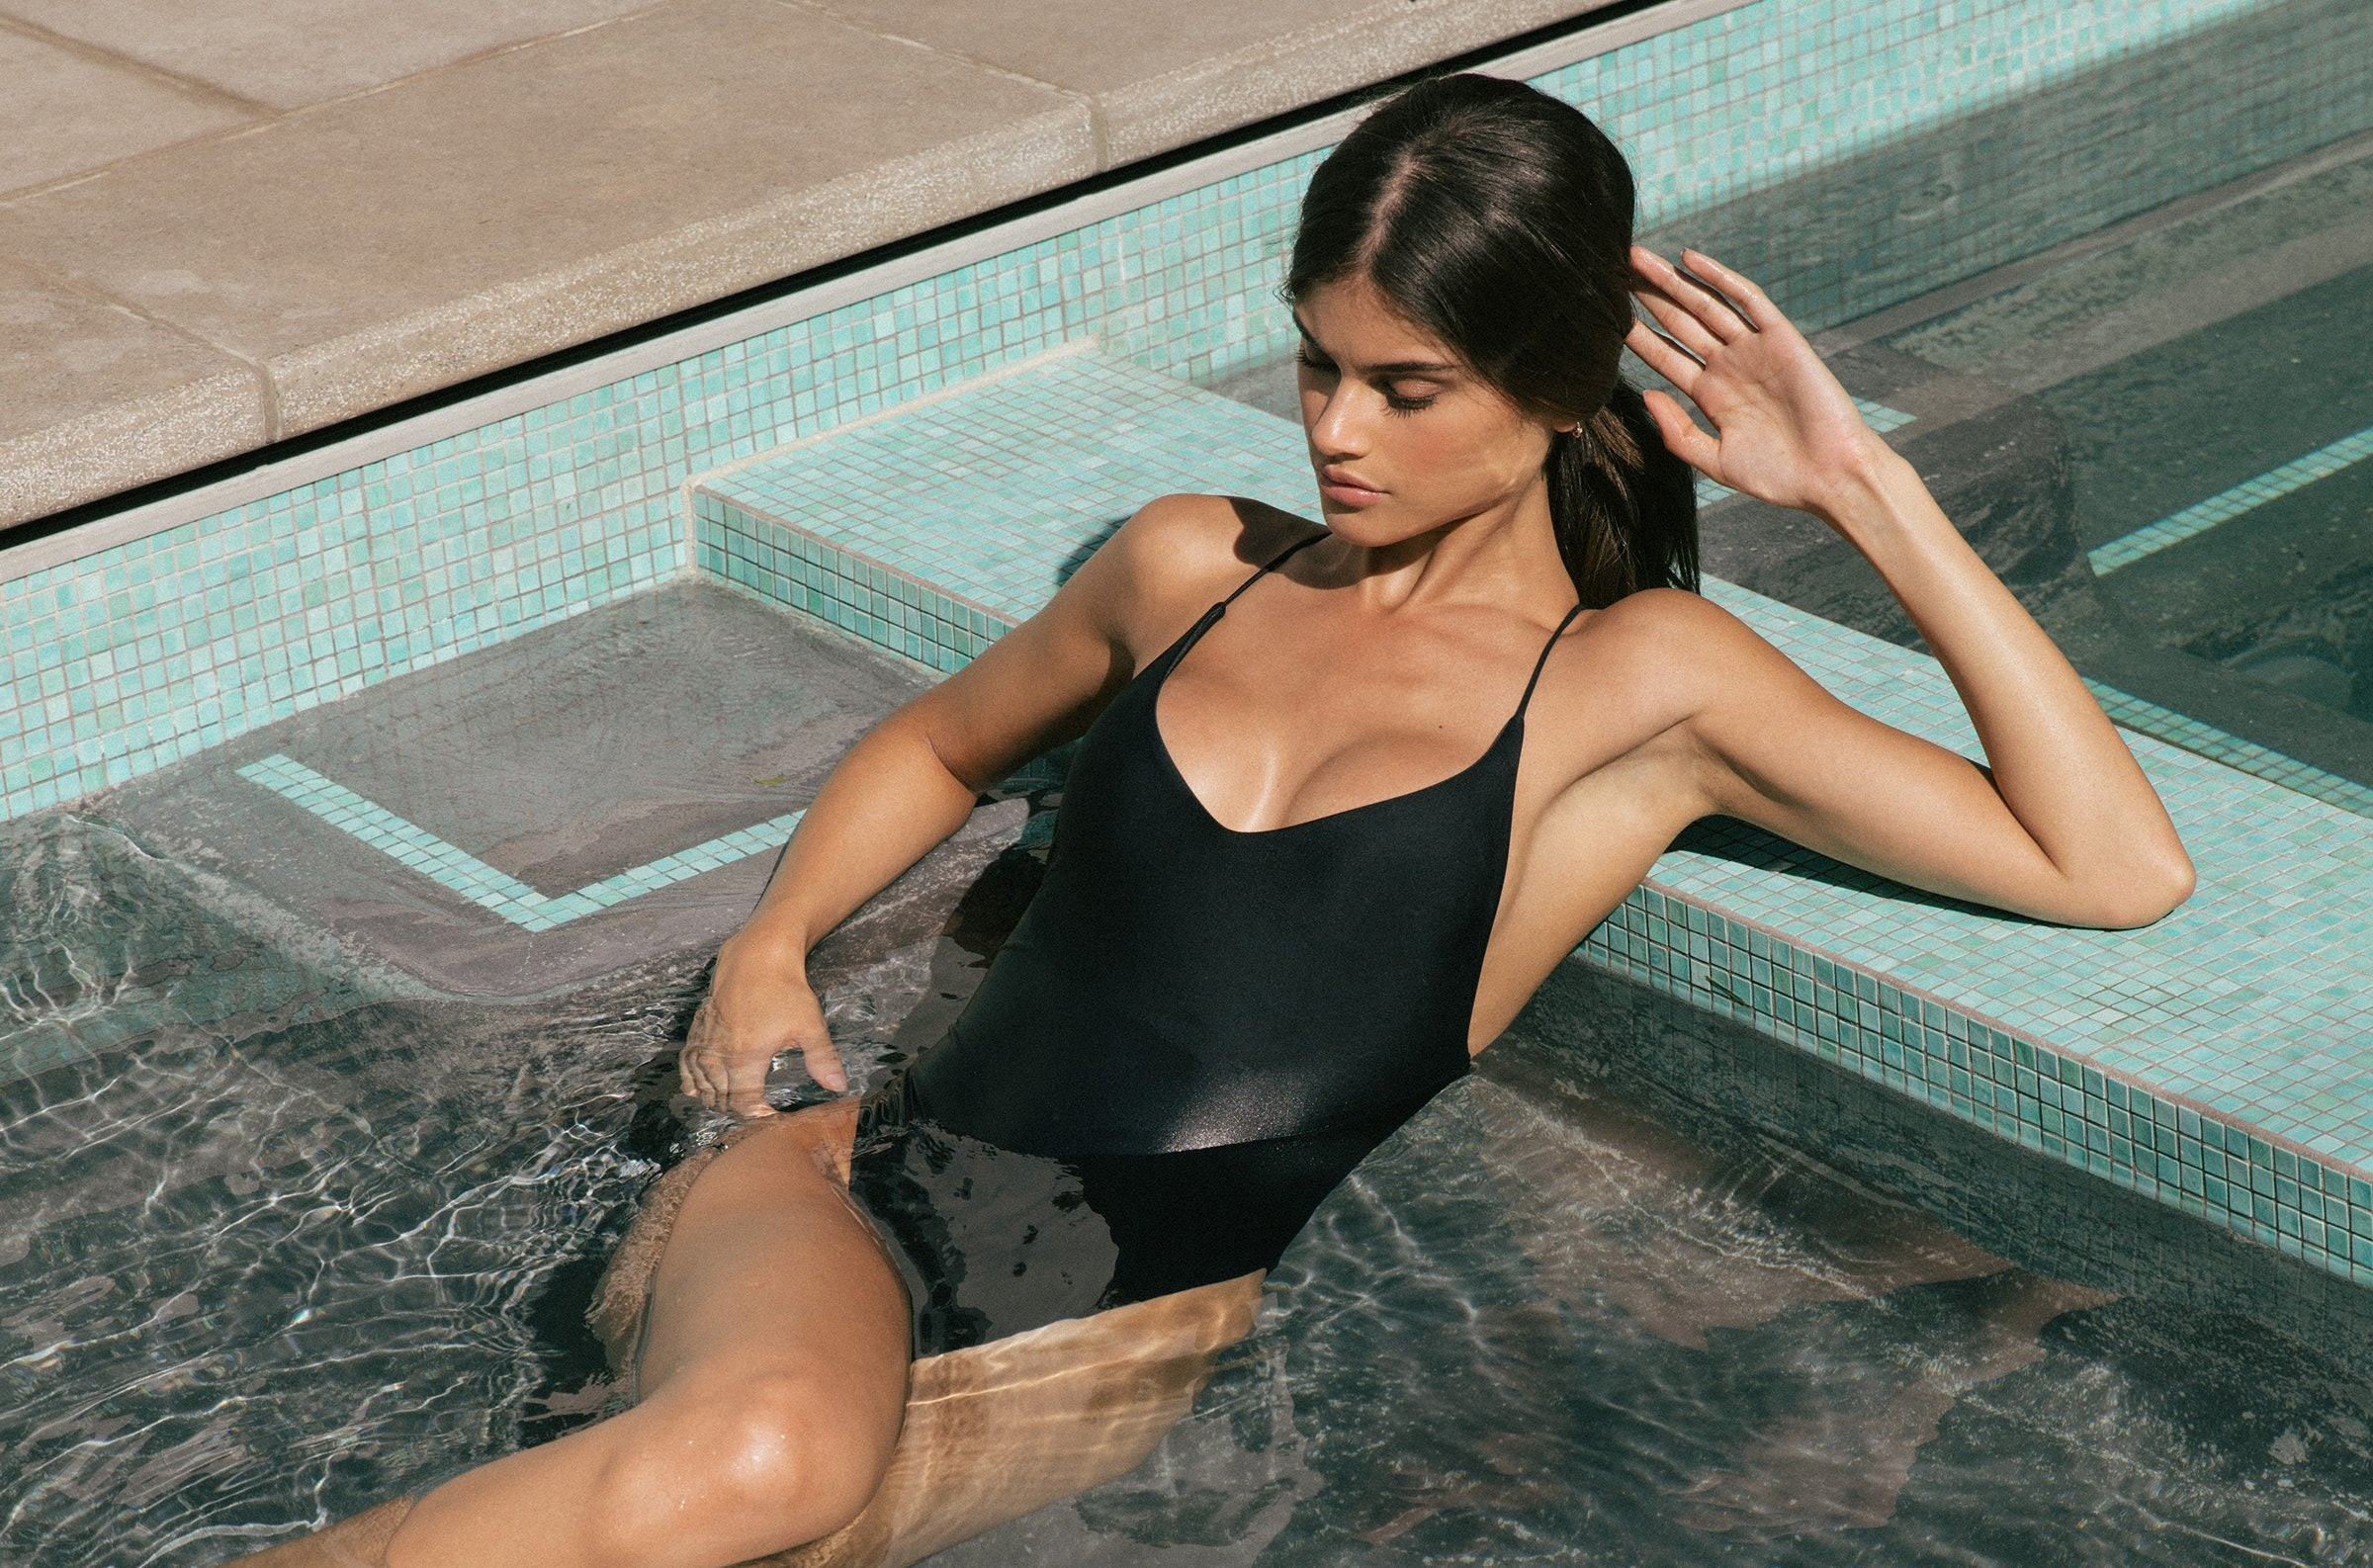 ohyeahgirl Bikini Sets 2 Pieces Swimsuit Bathing Suits for Women Black